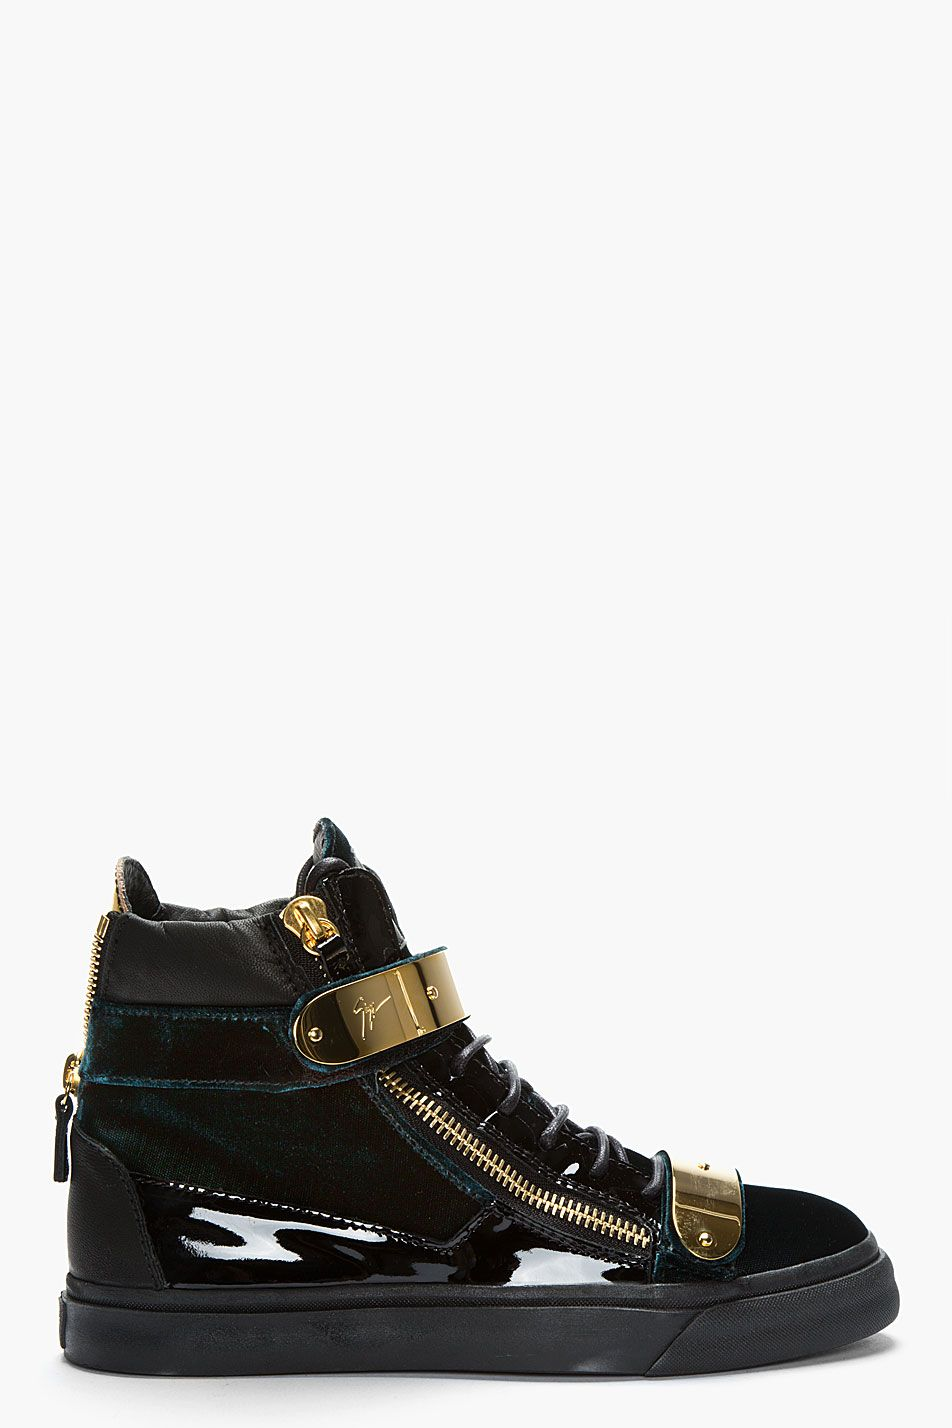 2f75263af92d2 Giuseppe Zanotti Ssense Exclusive Green Velvet Sneakers | Sneakers ...